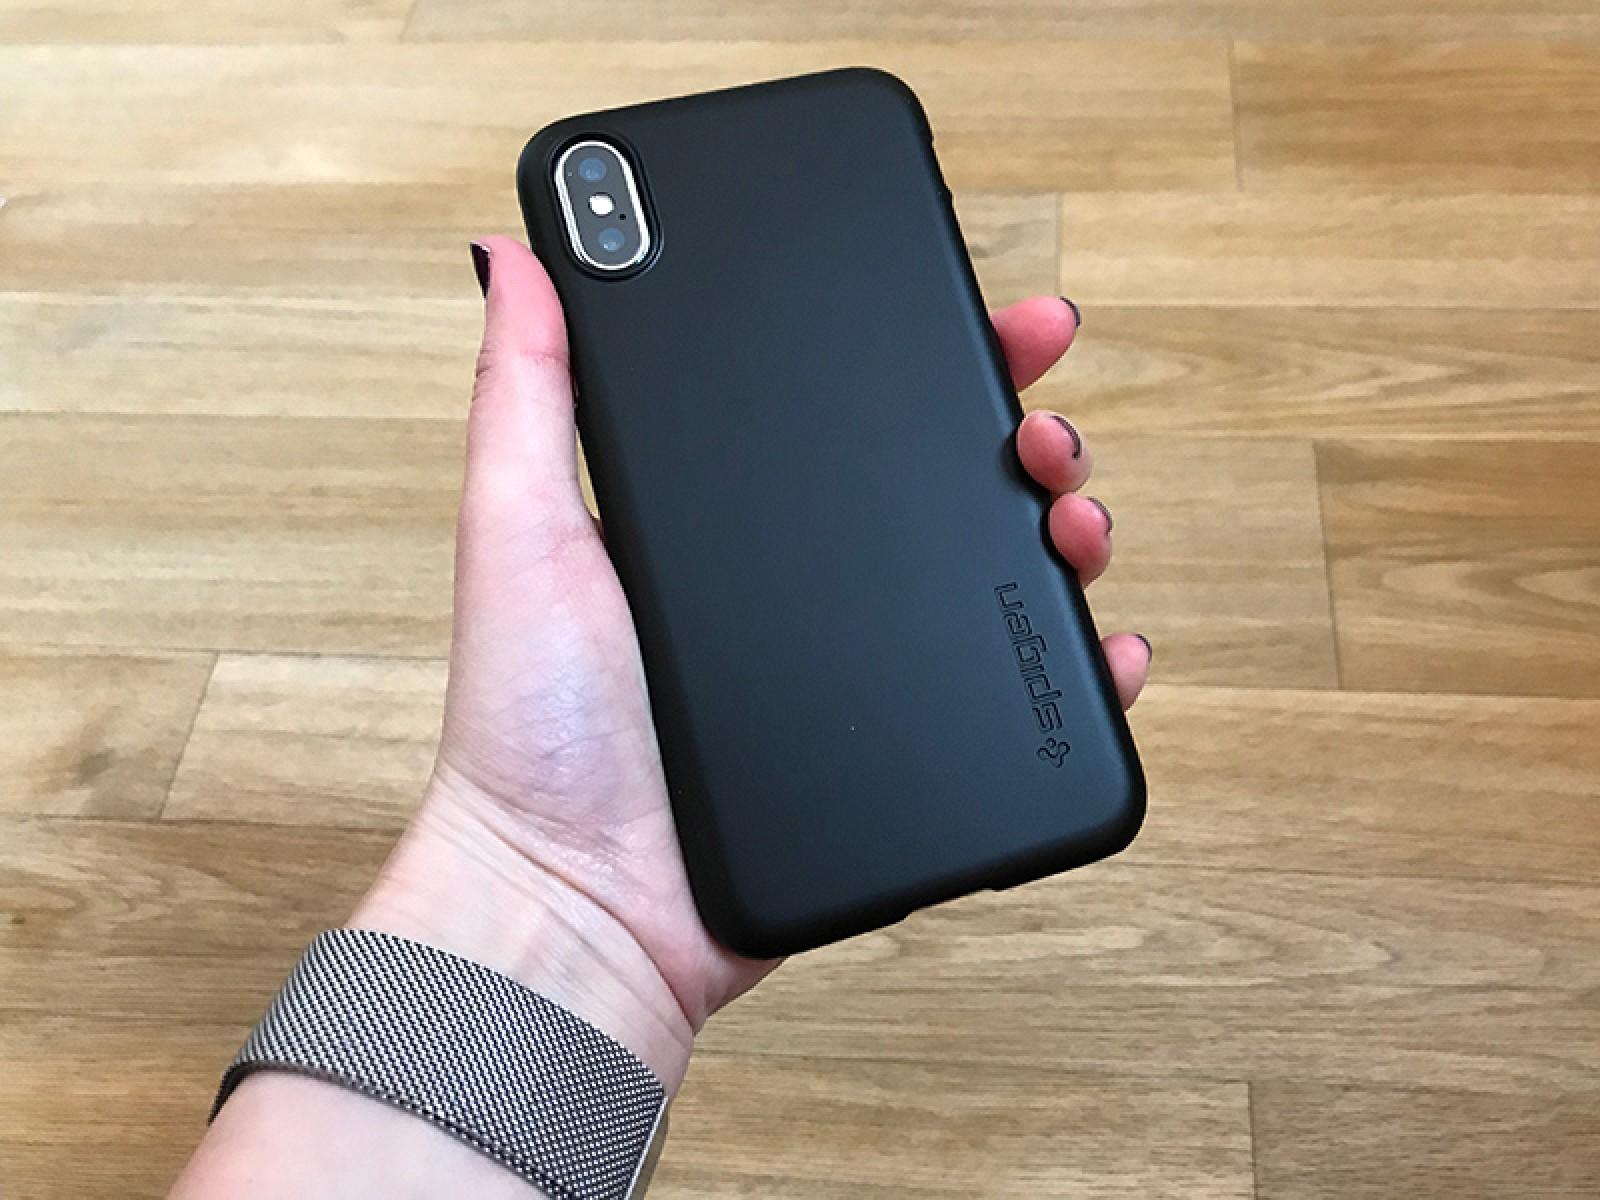 7b8b88d81 iPhone X Case Review Roundup 5  Spigen